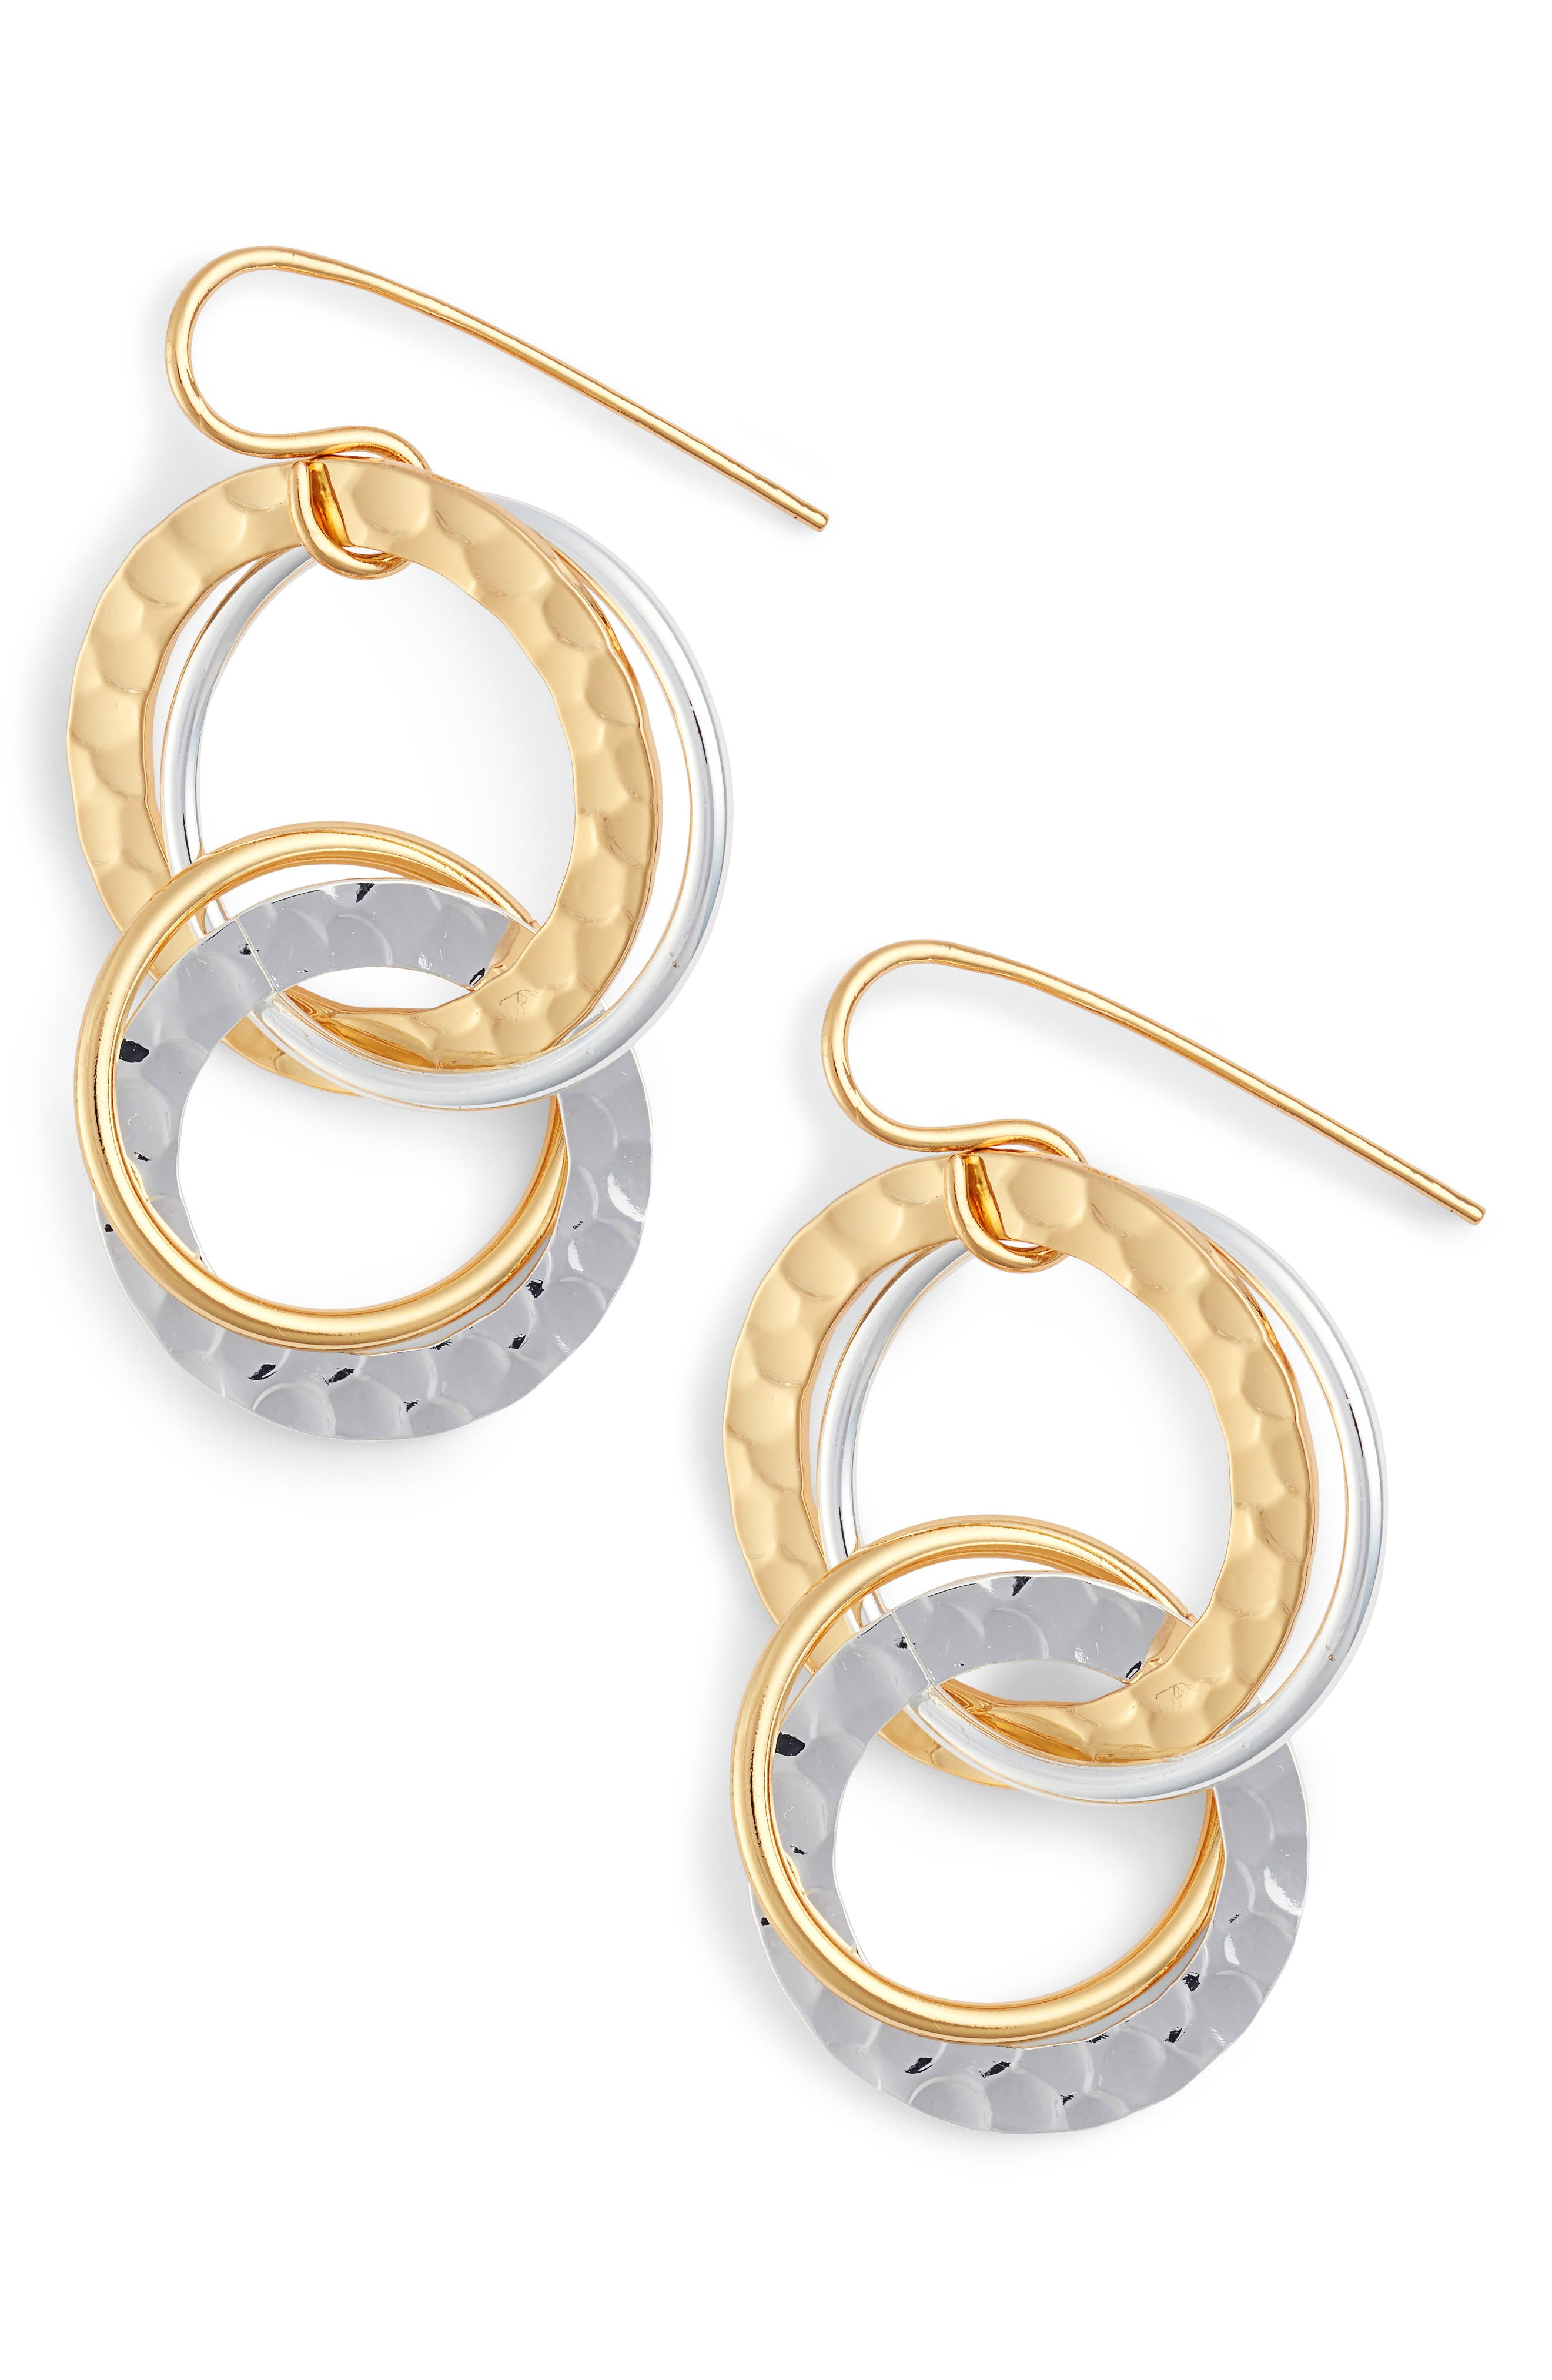 DVF Multi Ring Earrings